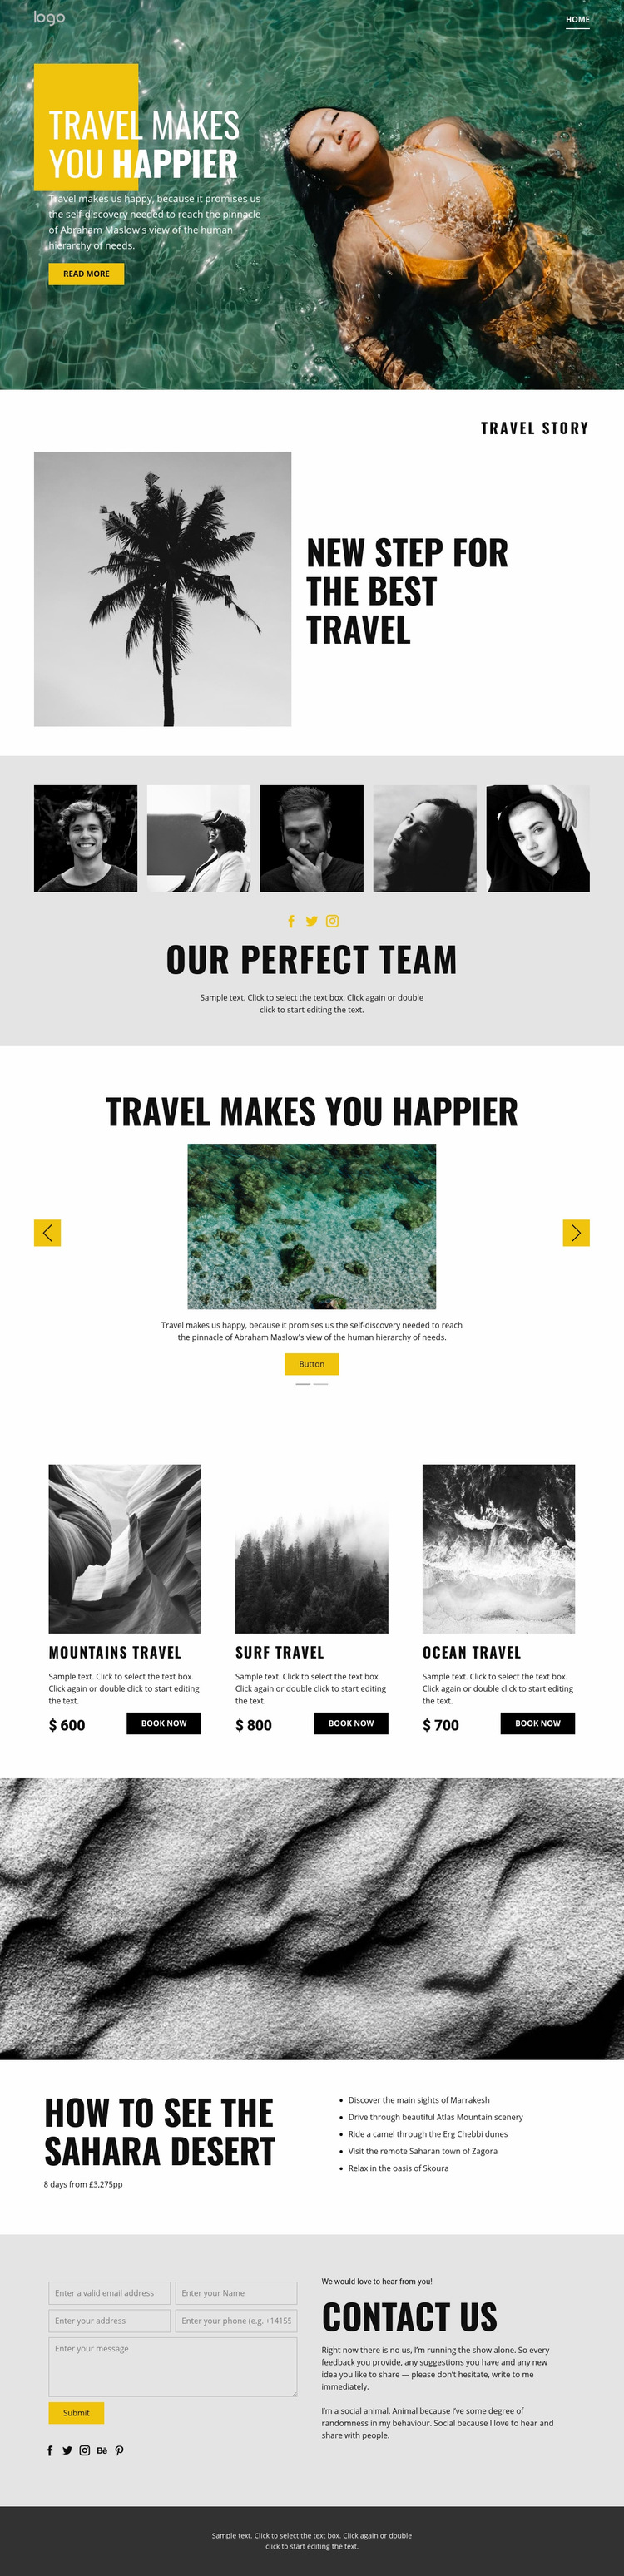 Happy people deserve travel Web Page Design